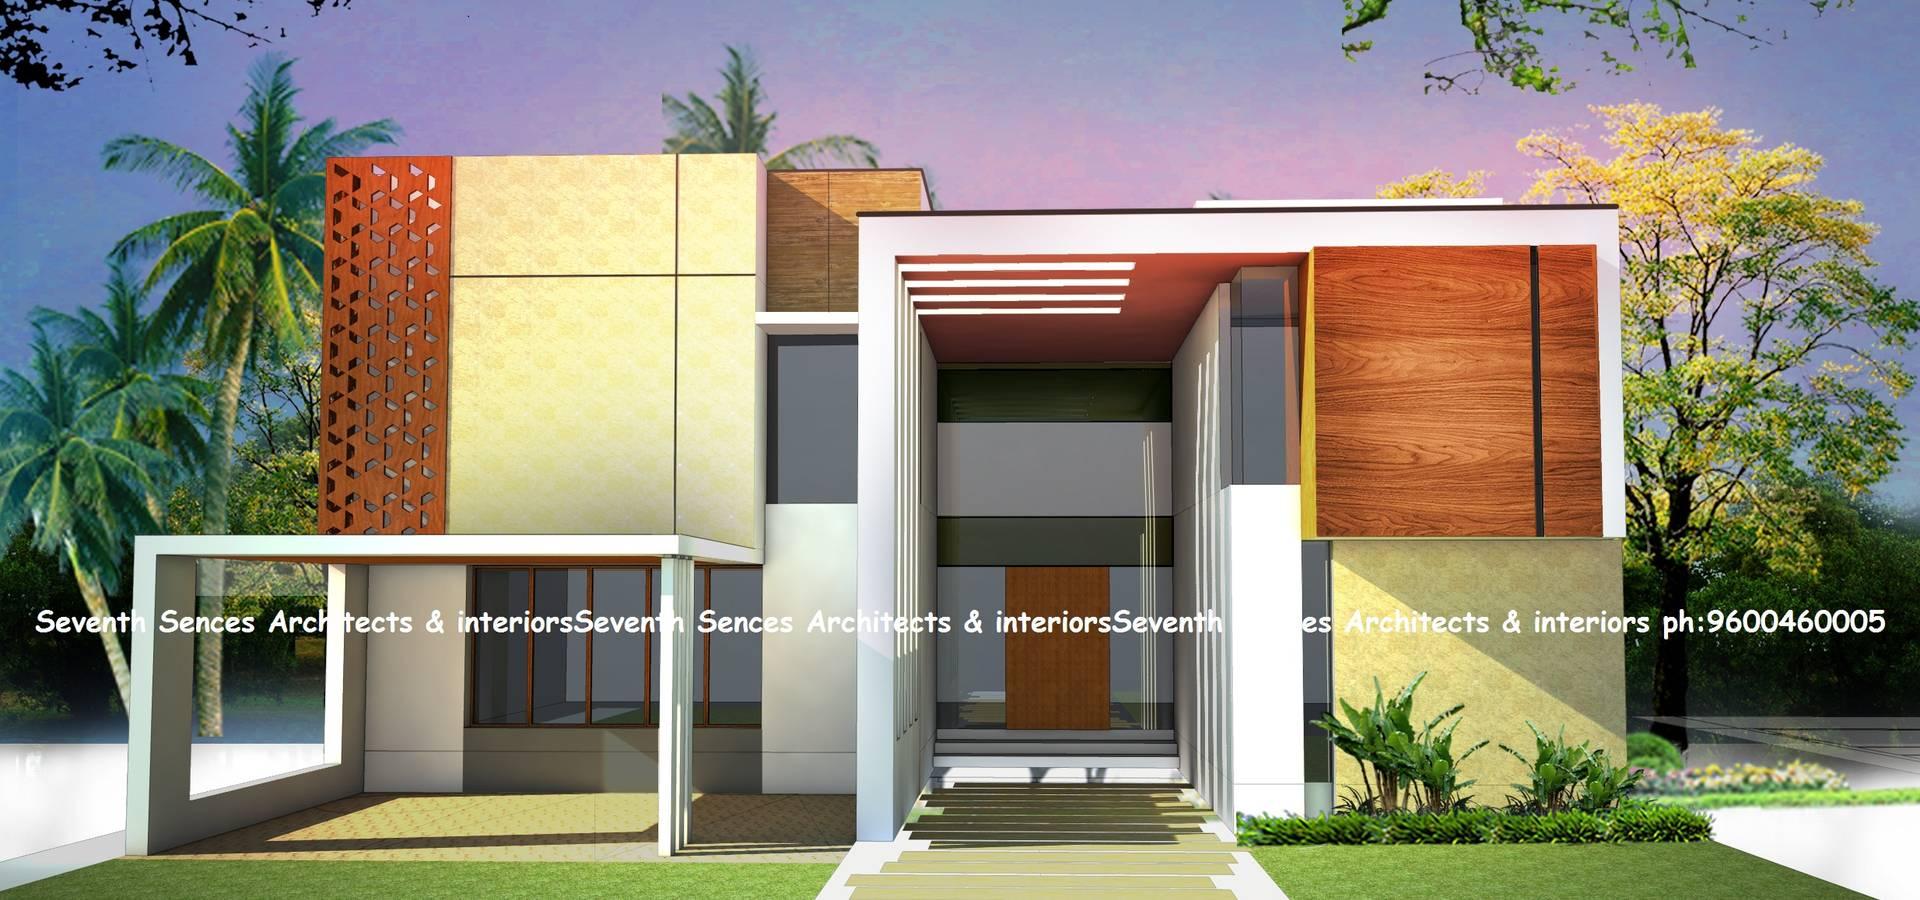 Seventh Sence Architects & interior